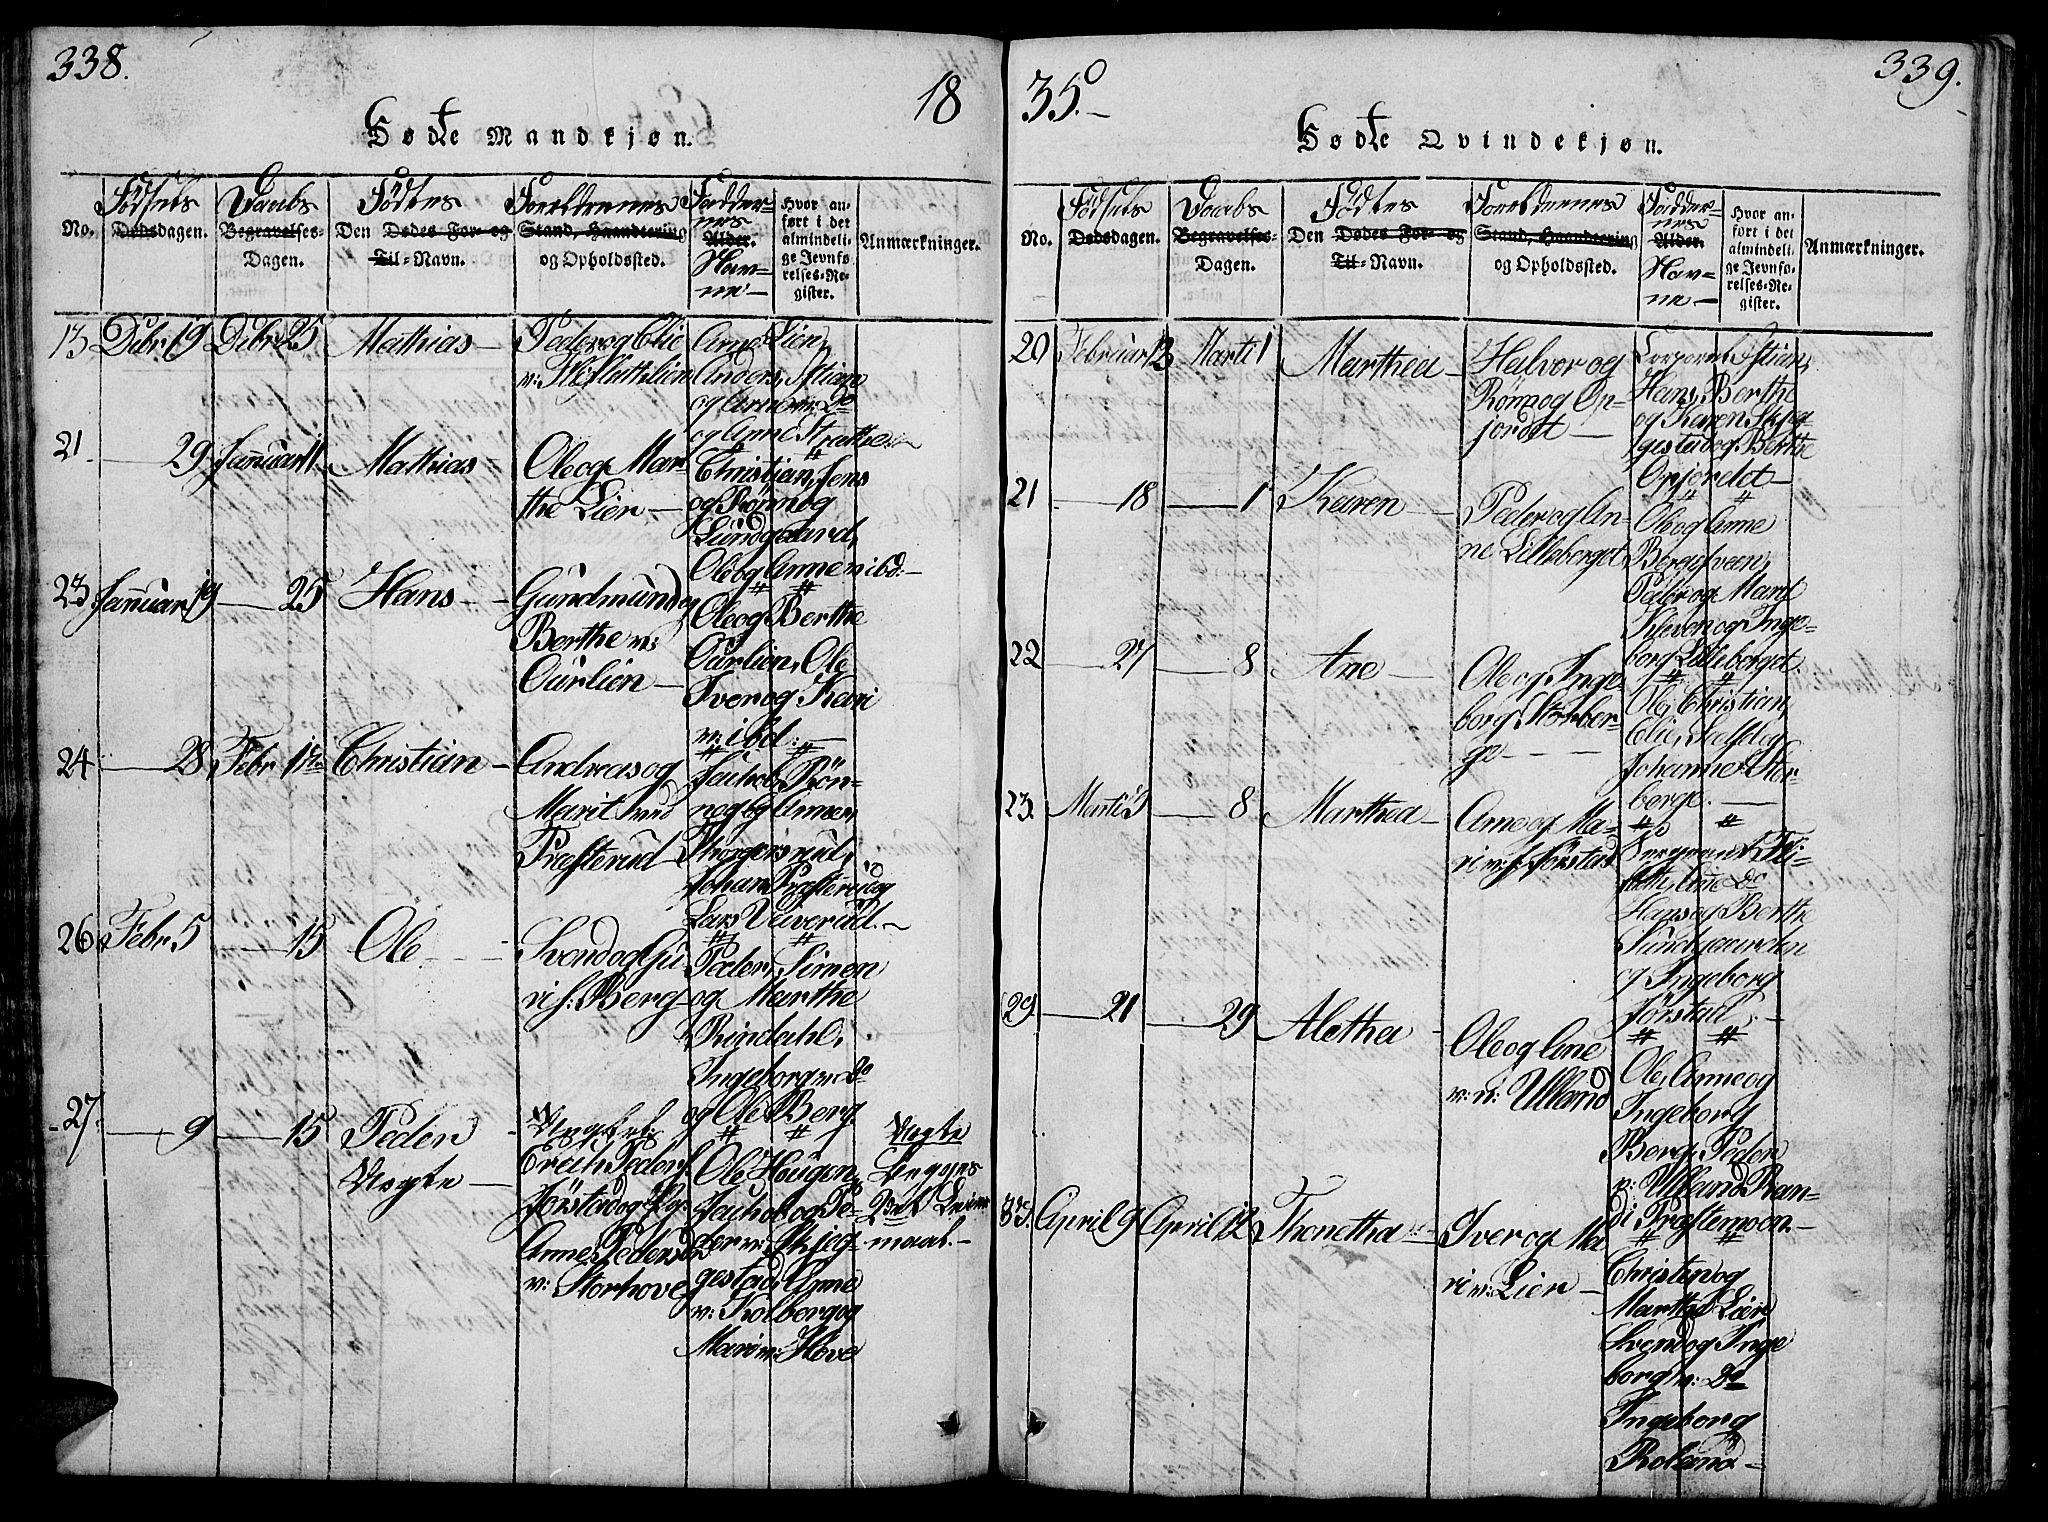 SAH, Fåberg prestekontor, H/Ha/Hab/L0004: Klokkerbok nr. 4, 1818-1837, s. 338-339